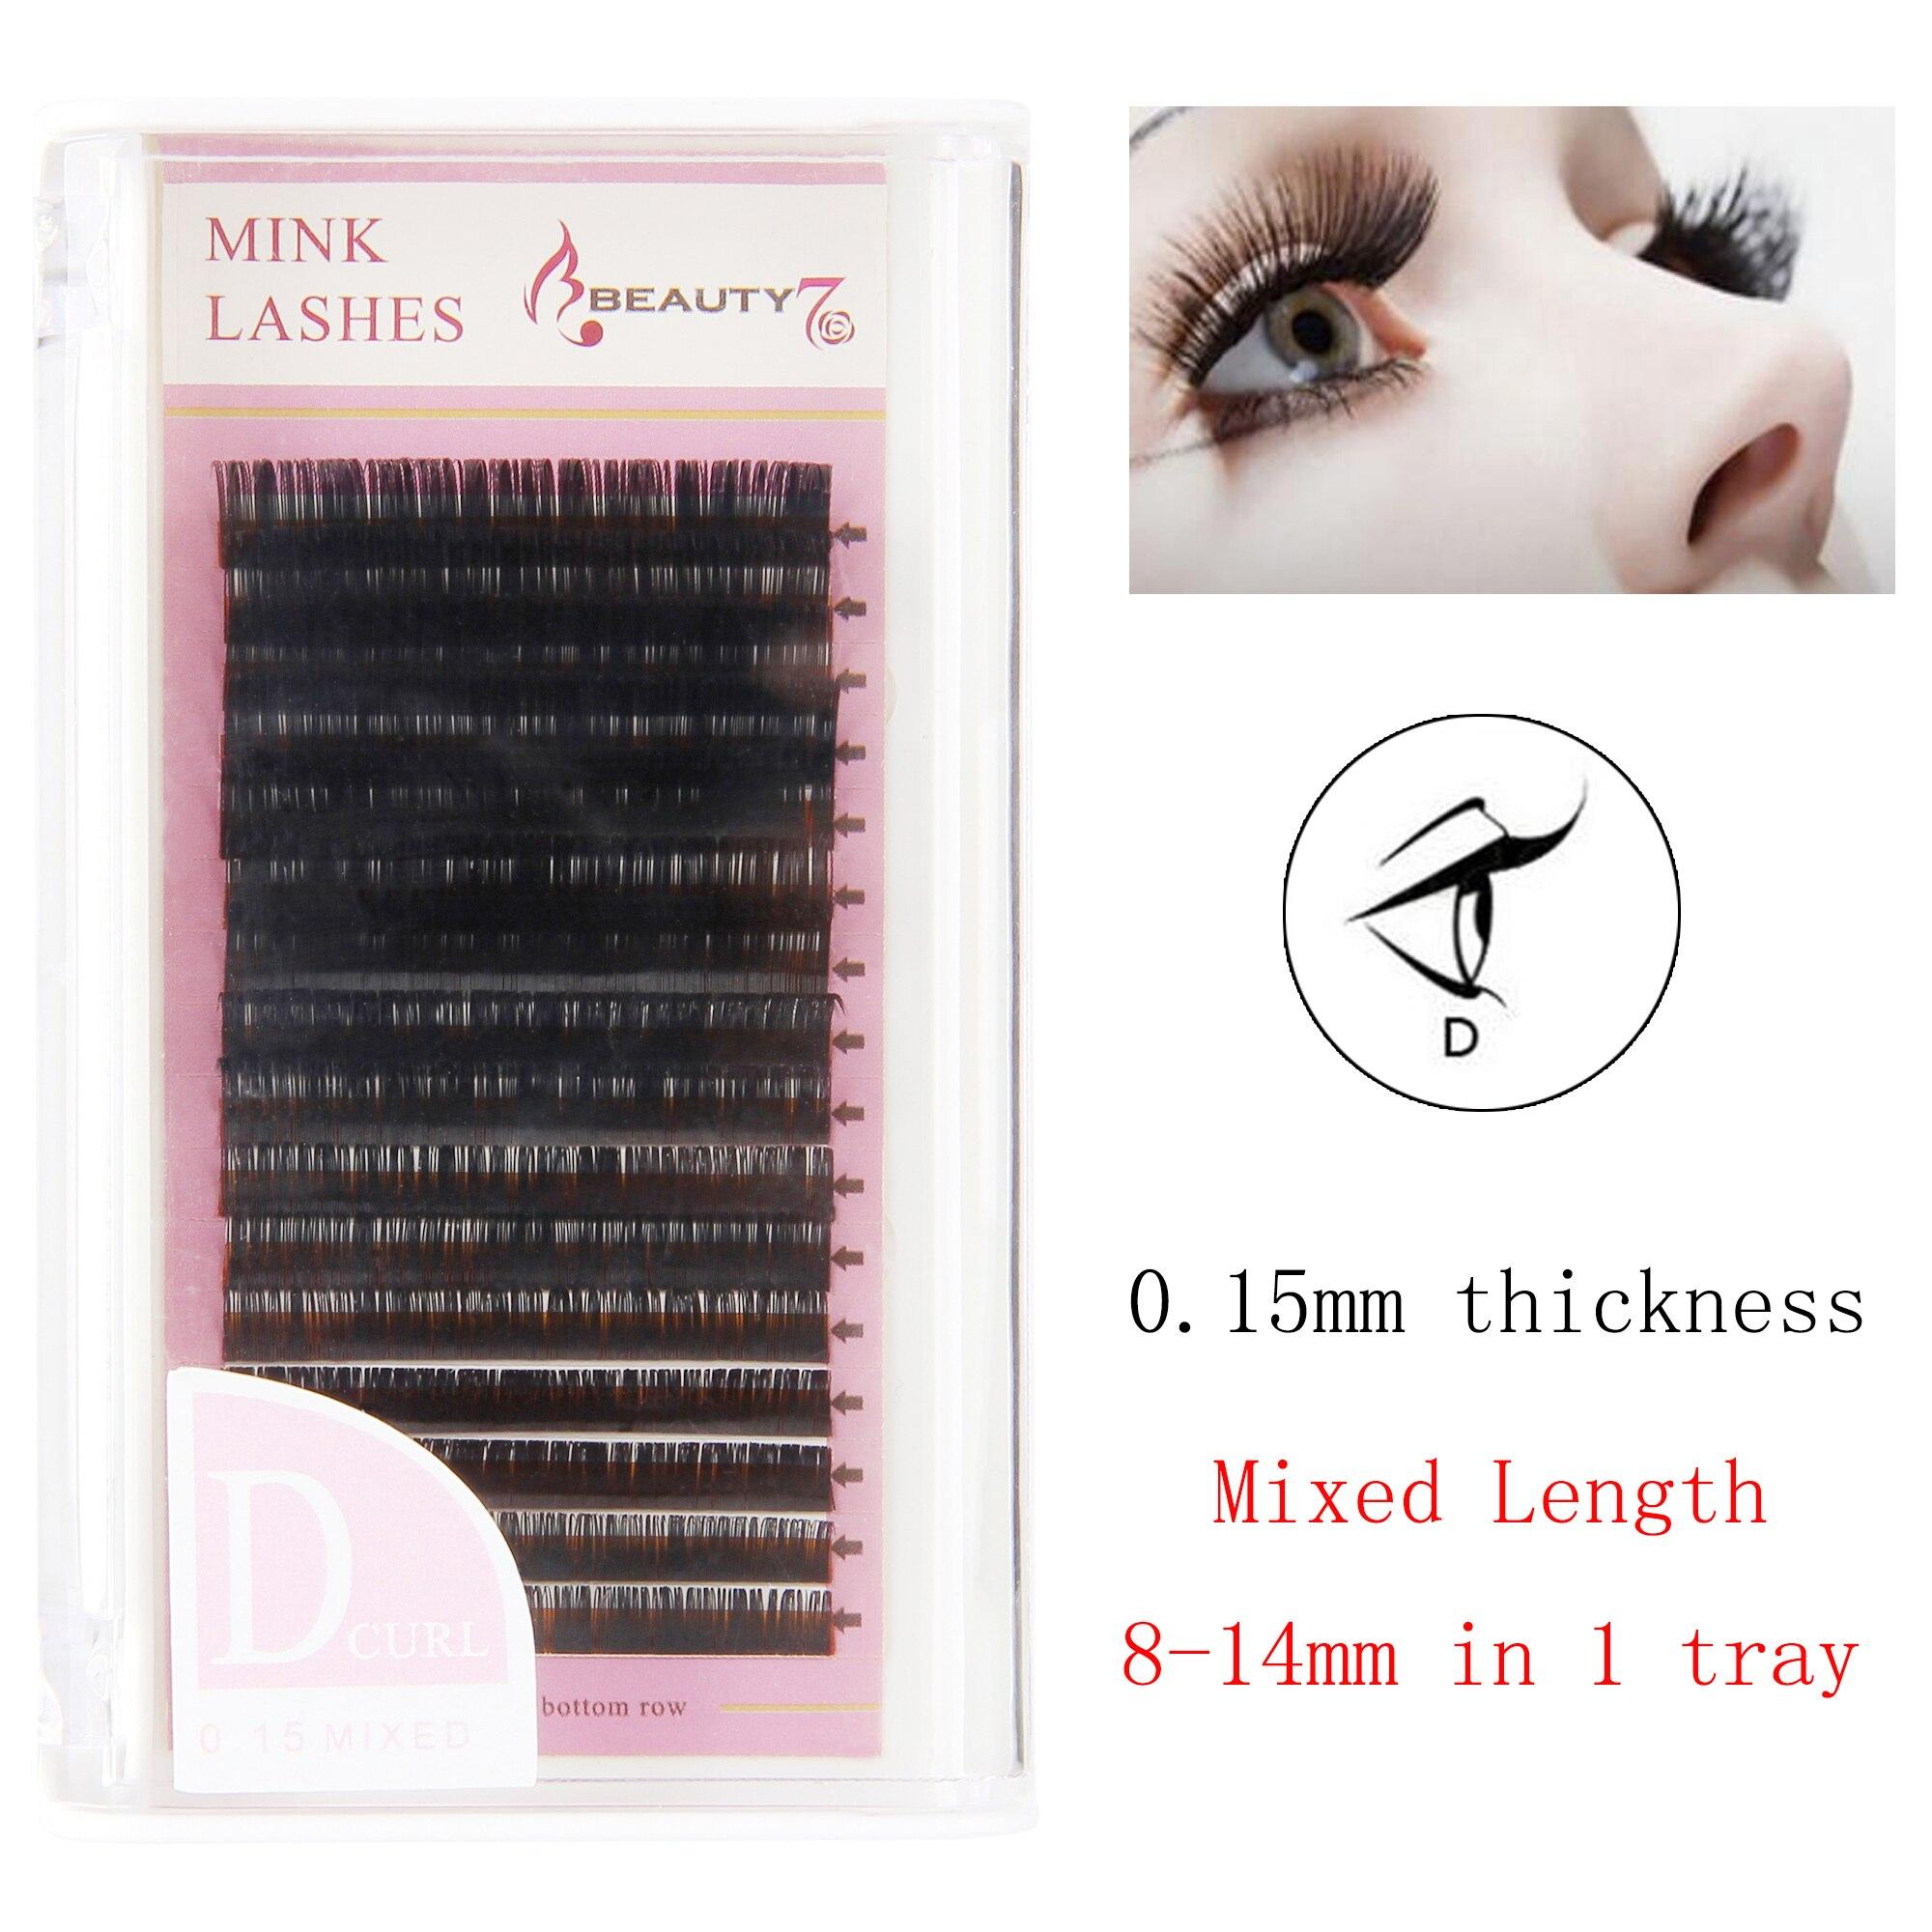 US $10 96 |BEAUTY7 1pcs D Curl 0 15mm*8 14mm Mixed Mink Eye Lashes  Individual Eyelash False Eyelashes Handmade Natural Eyelash Extension-in  False